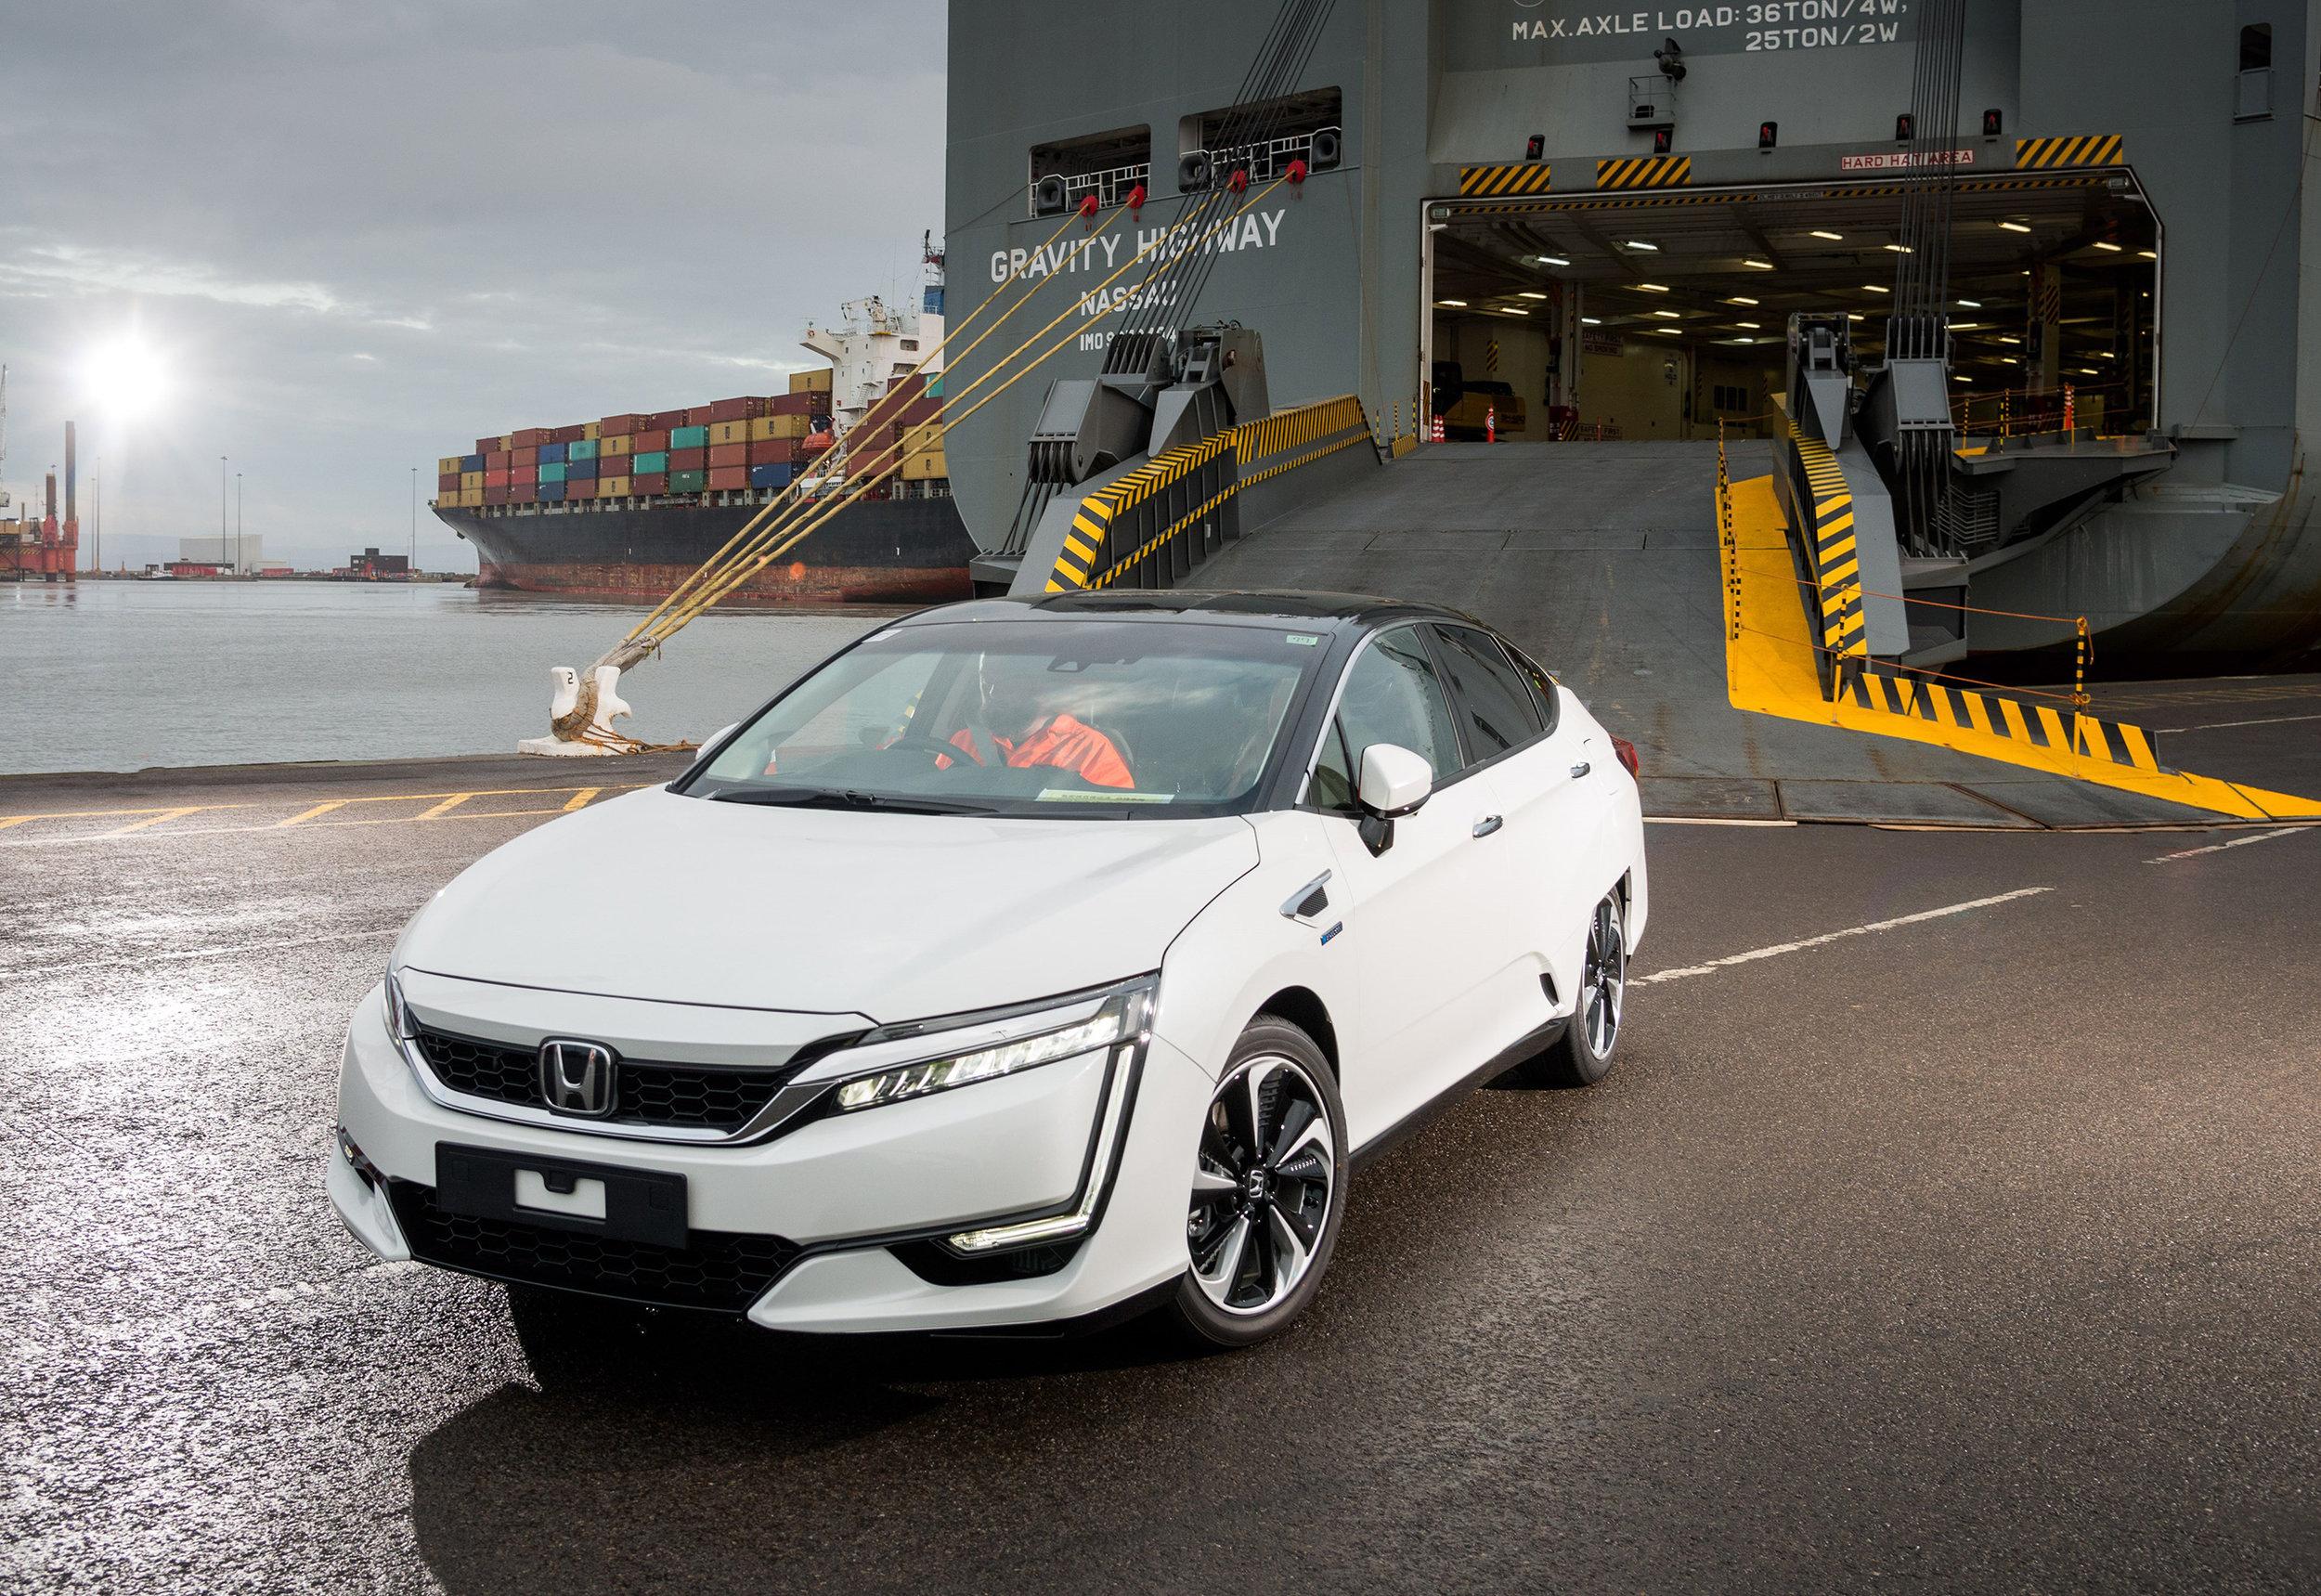 102256honda_100082_First_Honda_Clarity_Fuel_Cell_Arrives_in_Europe.jpg